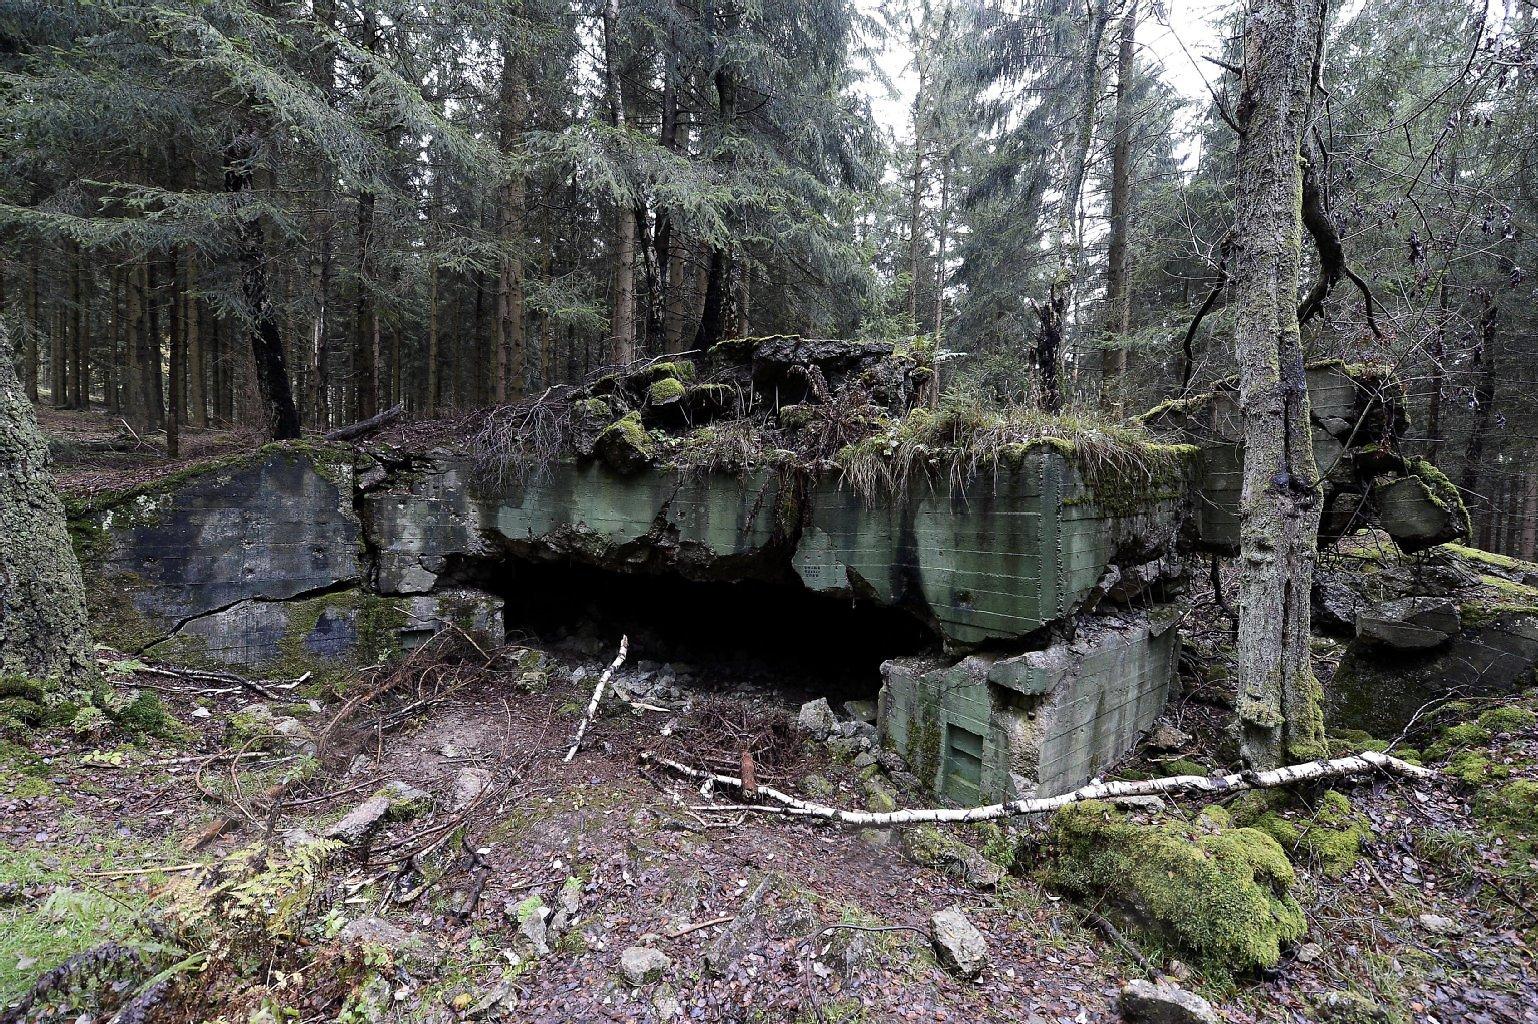 The Hürtgen Forest Today (Source Unknown)